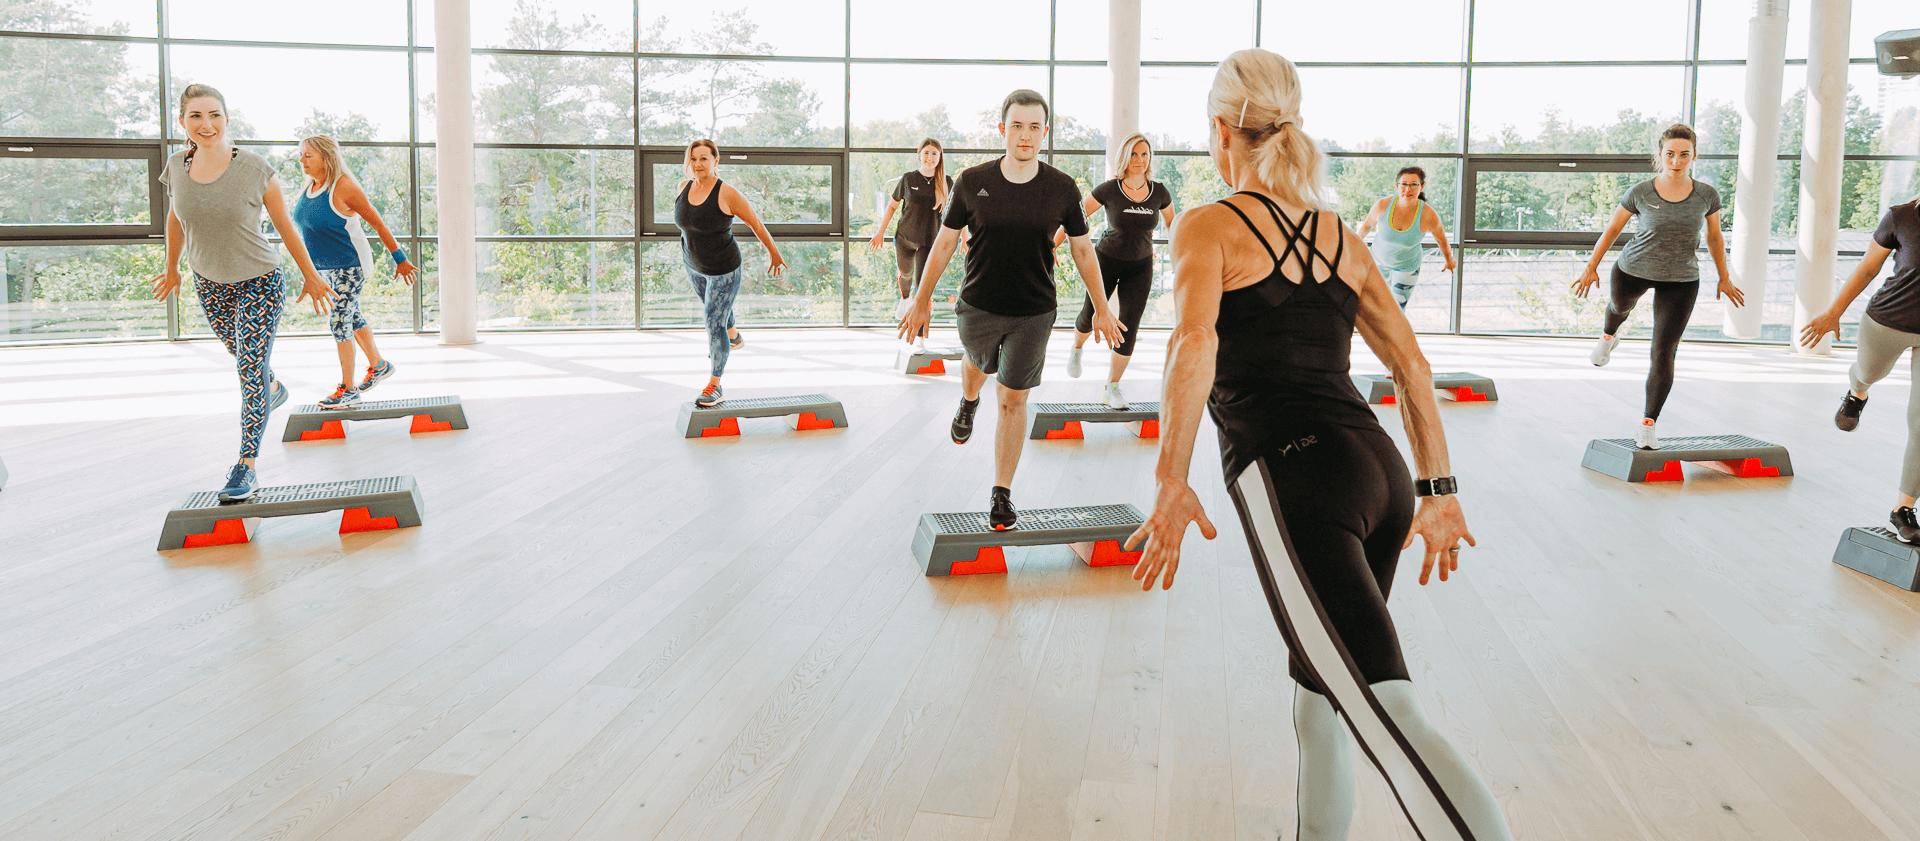 Aerobic-Kurs zur Fettverbrennung Abnehmen tanzen